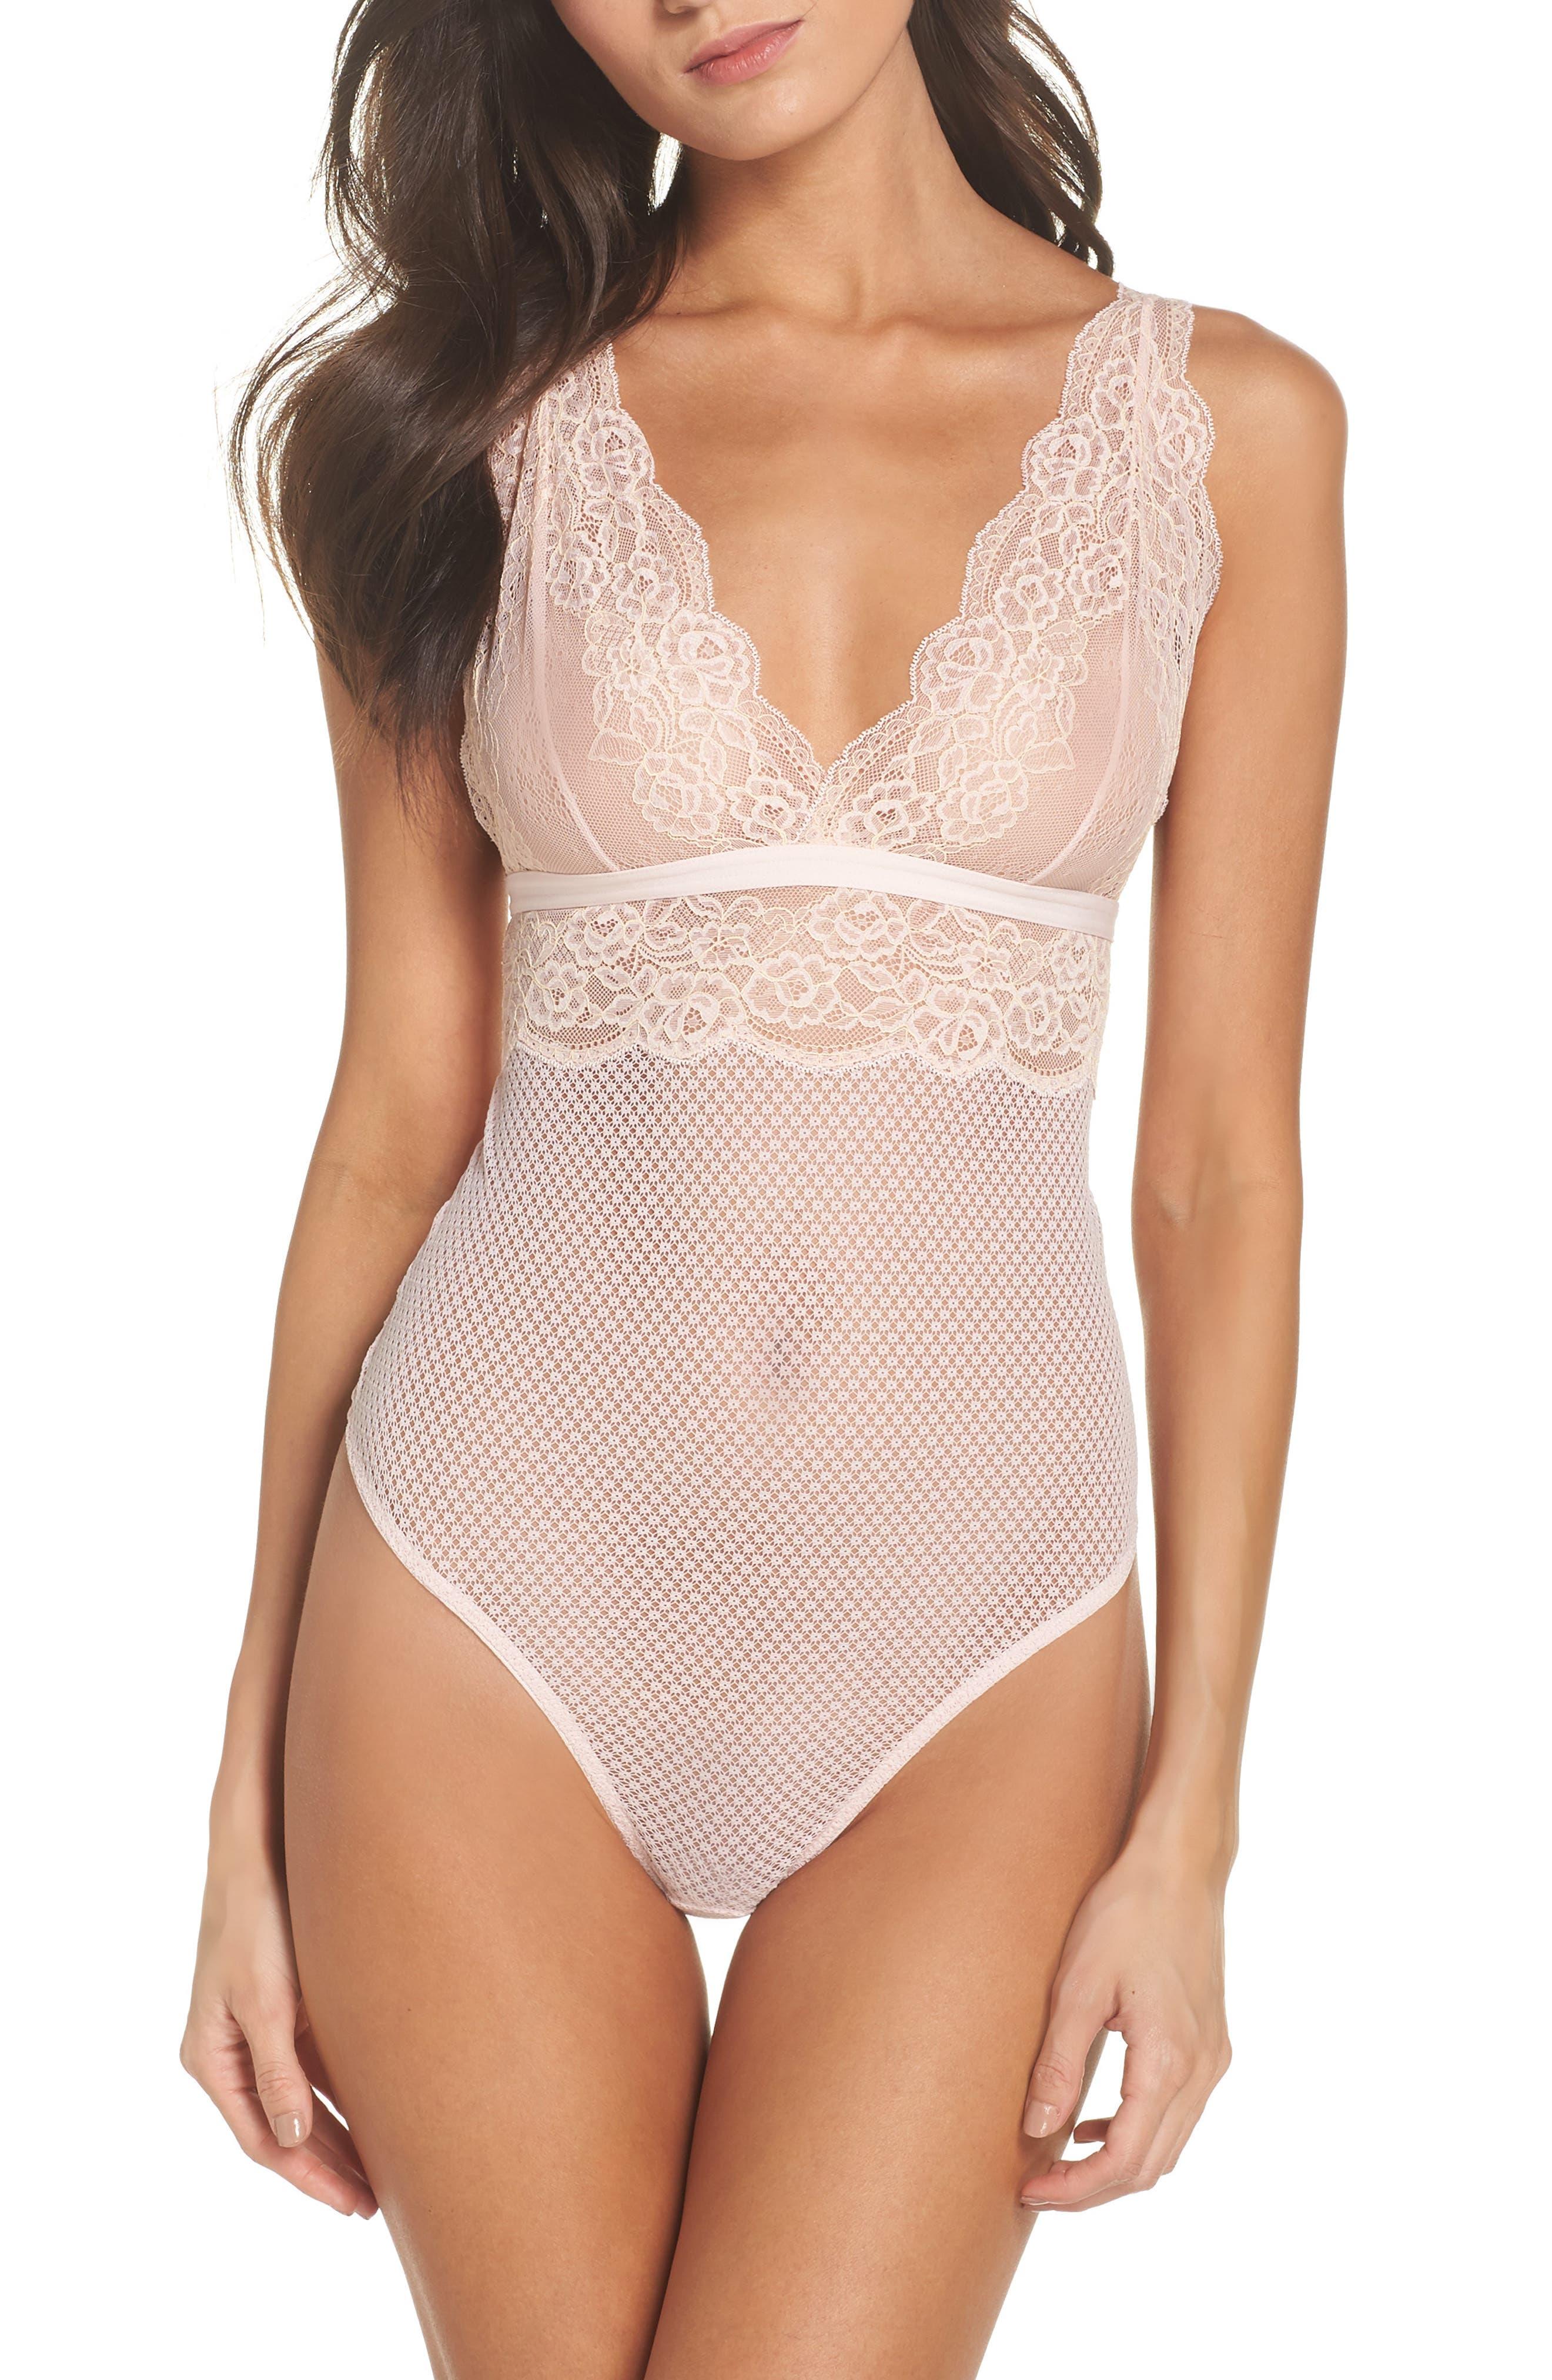 Erica Lace Thong Bodysuit,                         Main,                         color, Blush